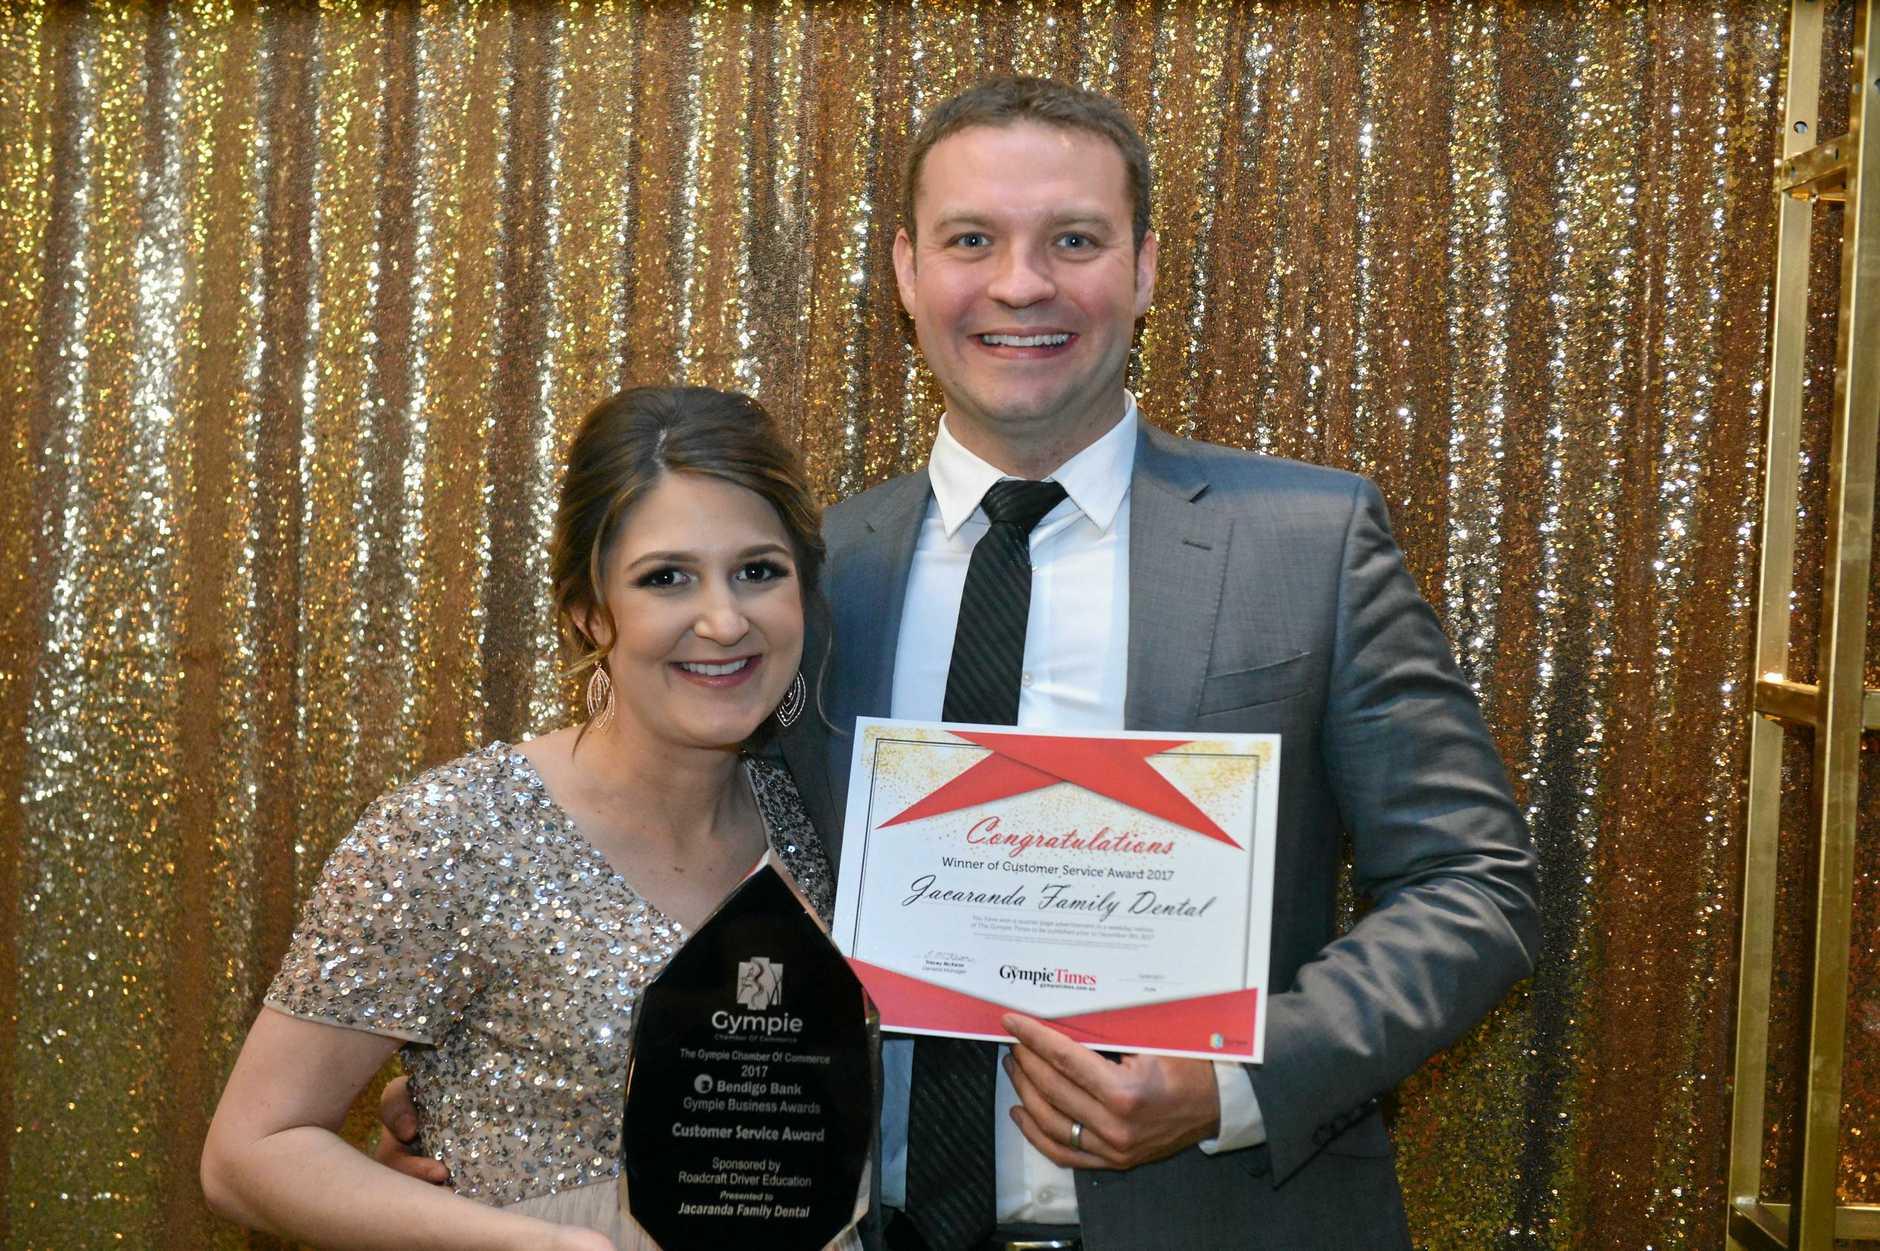 WINNERS: Gympie Chamber of Commerce Customer Service Award winners were Jacaranda Family Dental represented by Sam and Adam Bradshaw.